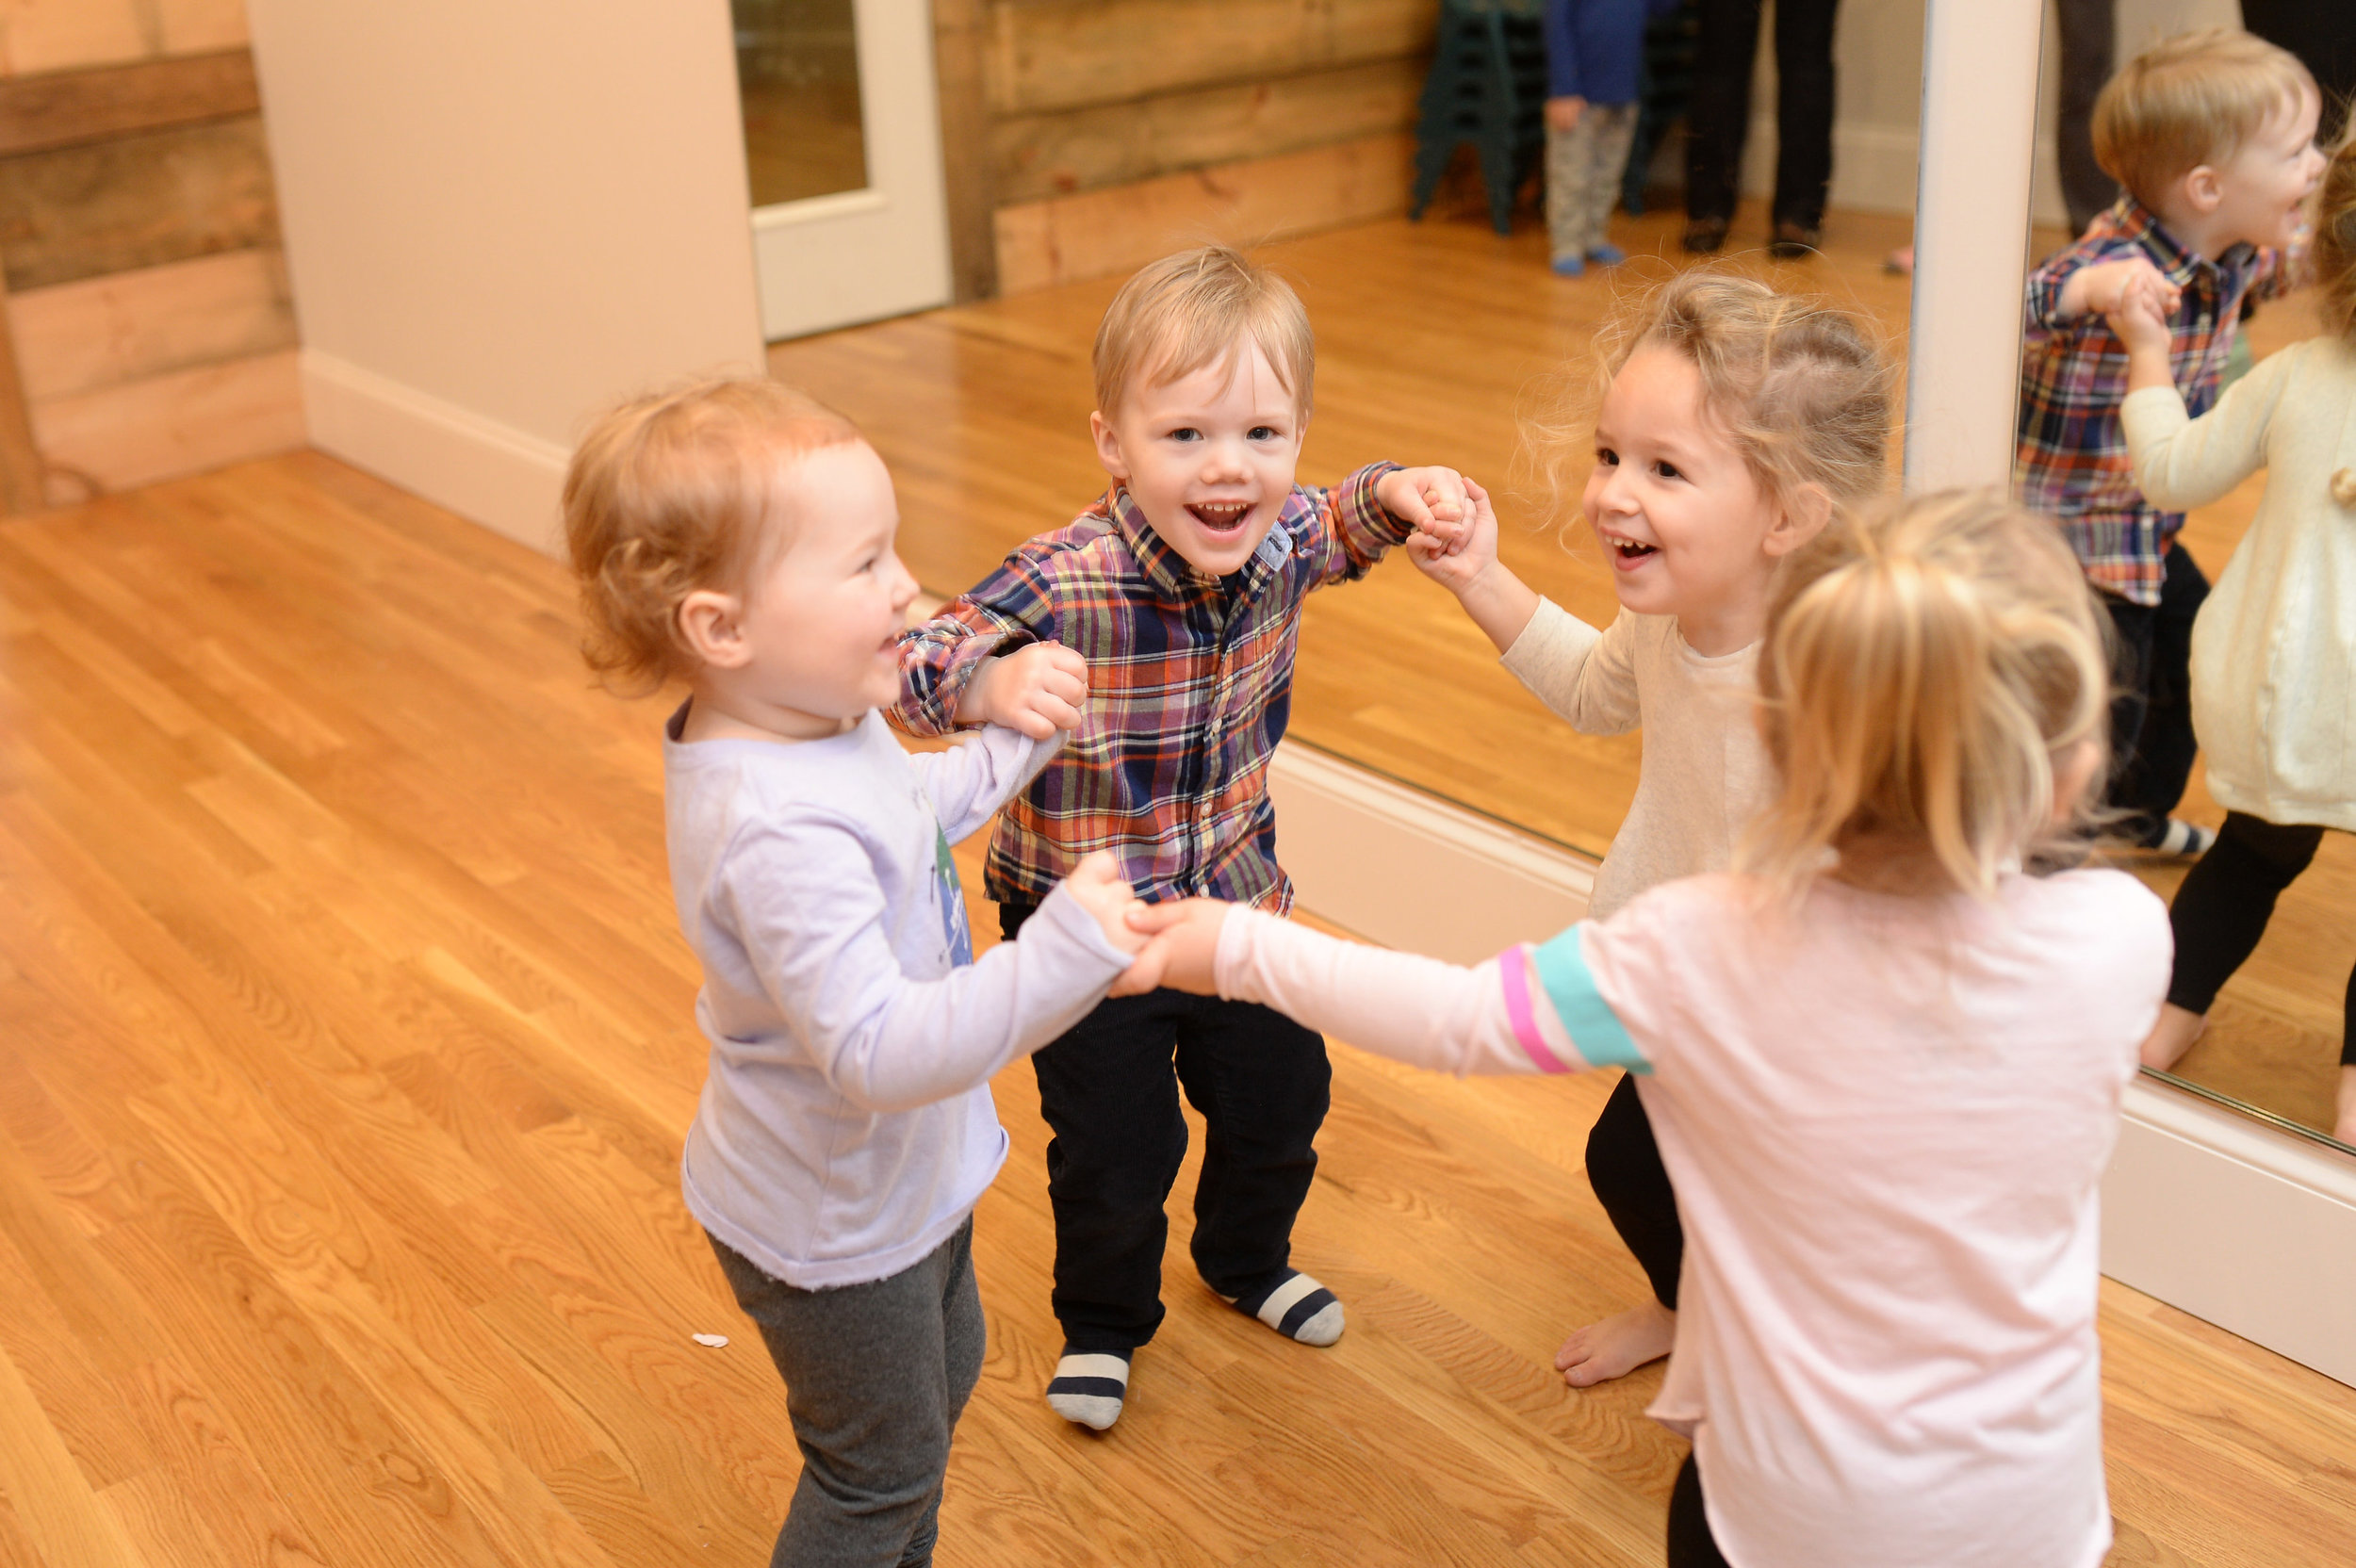 SOUTH BOSTON STUDIO - KIDS CLASSES | MOM & BABY CLASSES SUPPORT GROUPS | PRENATAL FITNESS